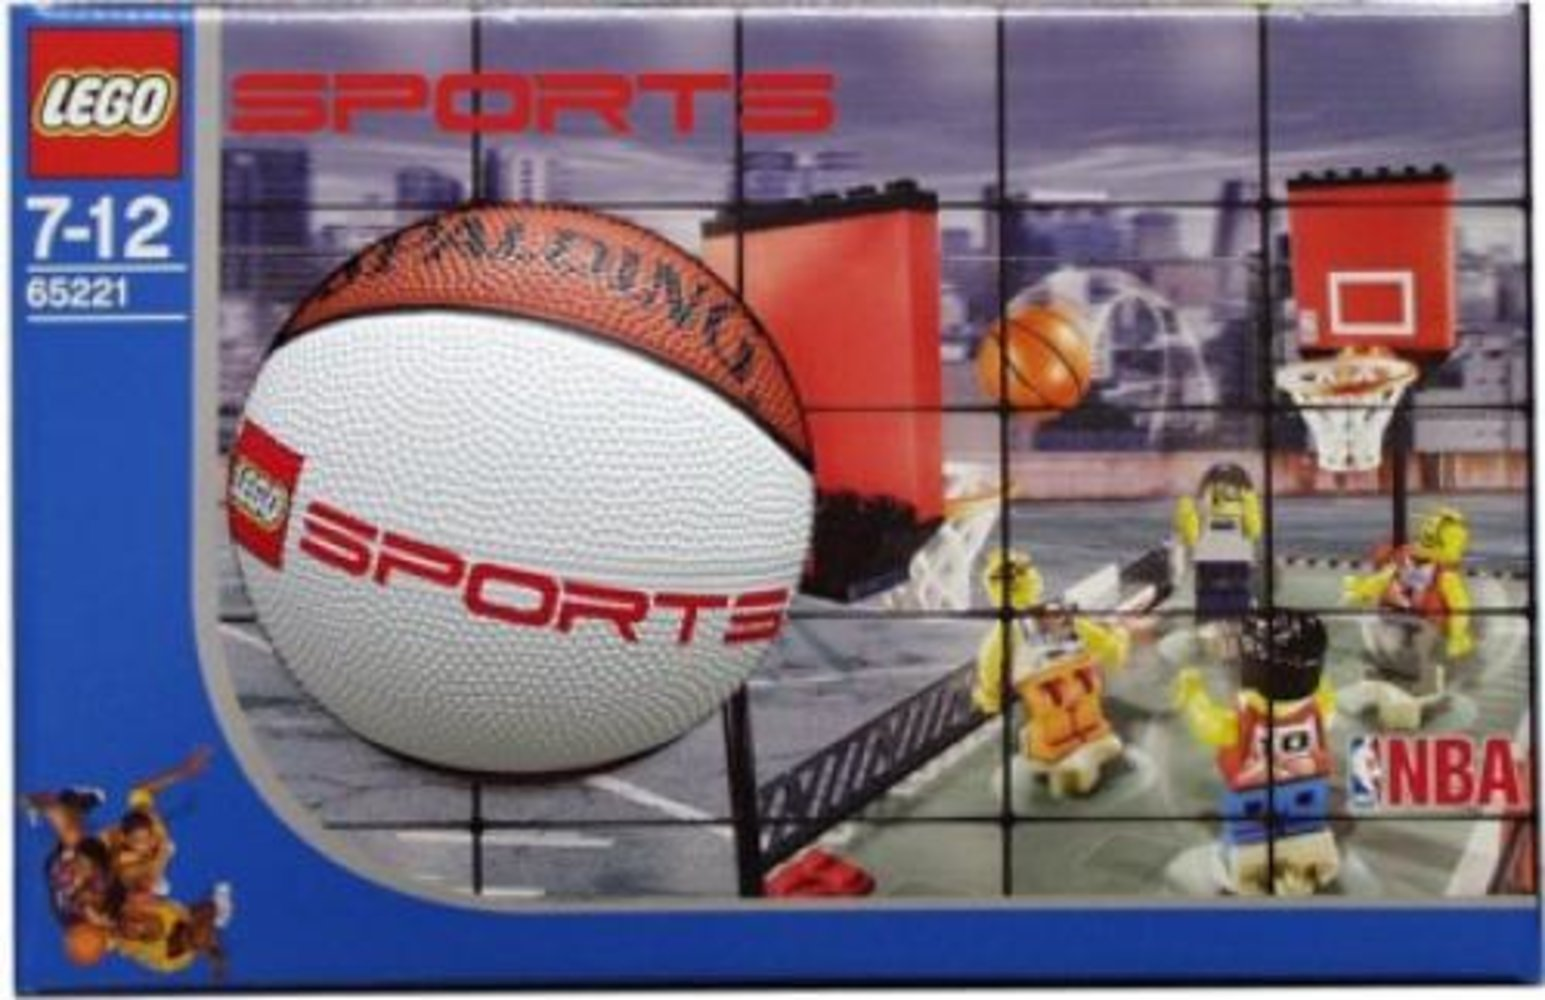 Streetball 2 vs 2 (box with mini basketball)